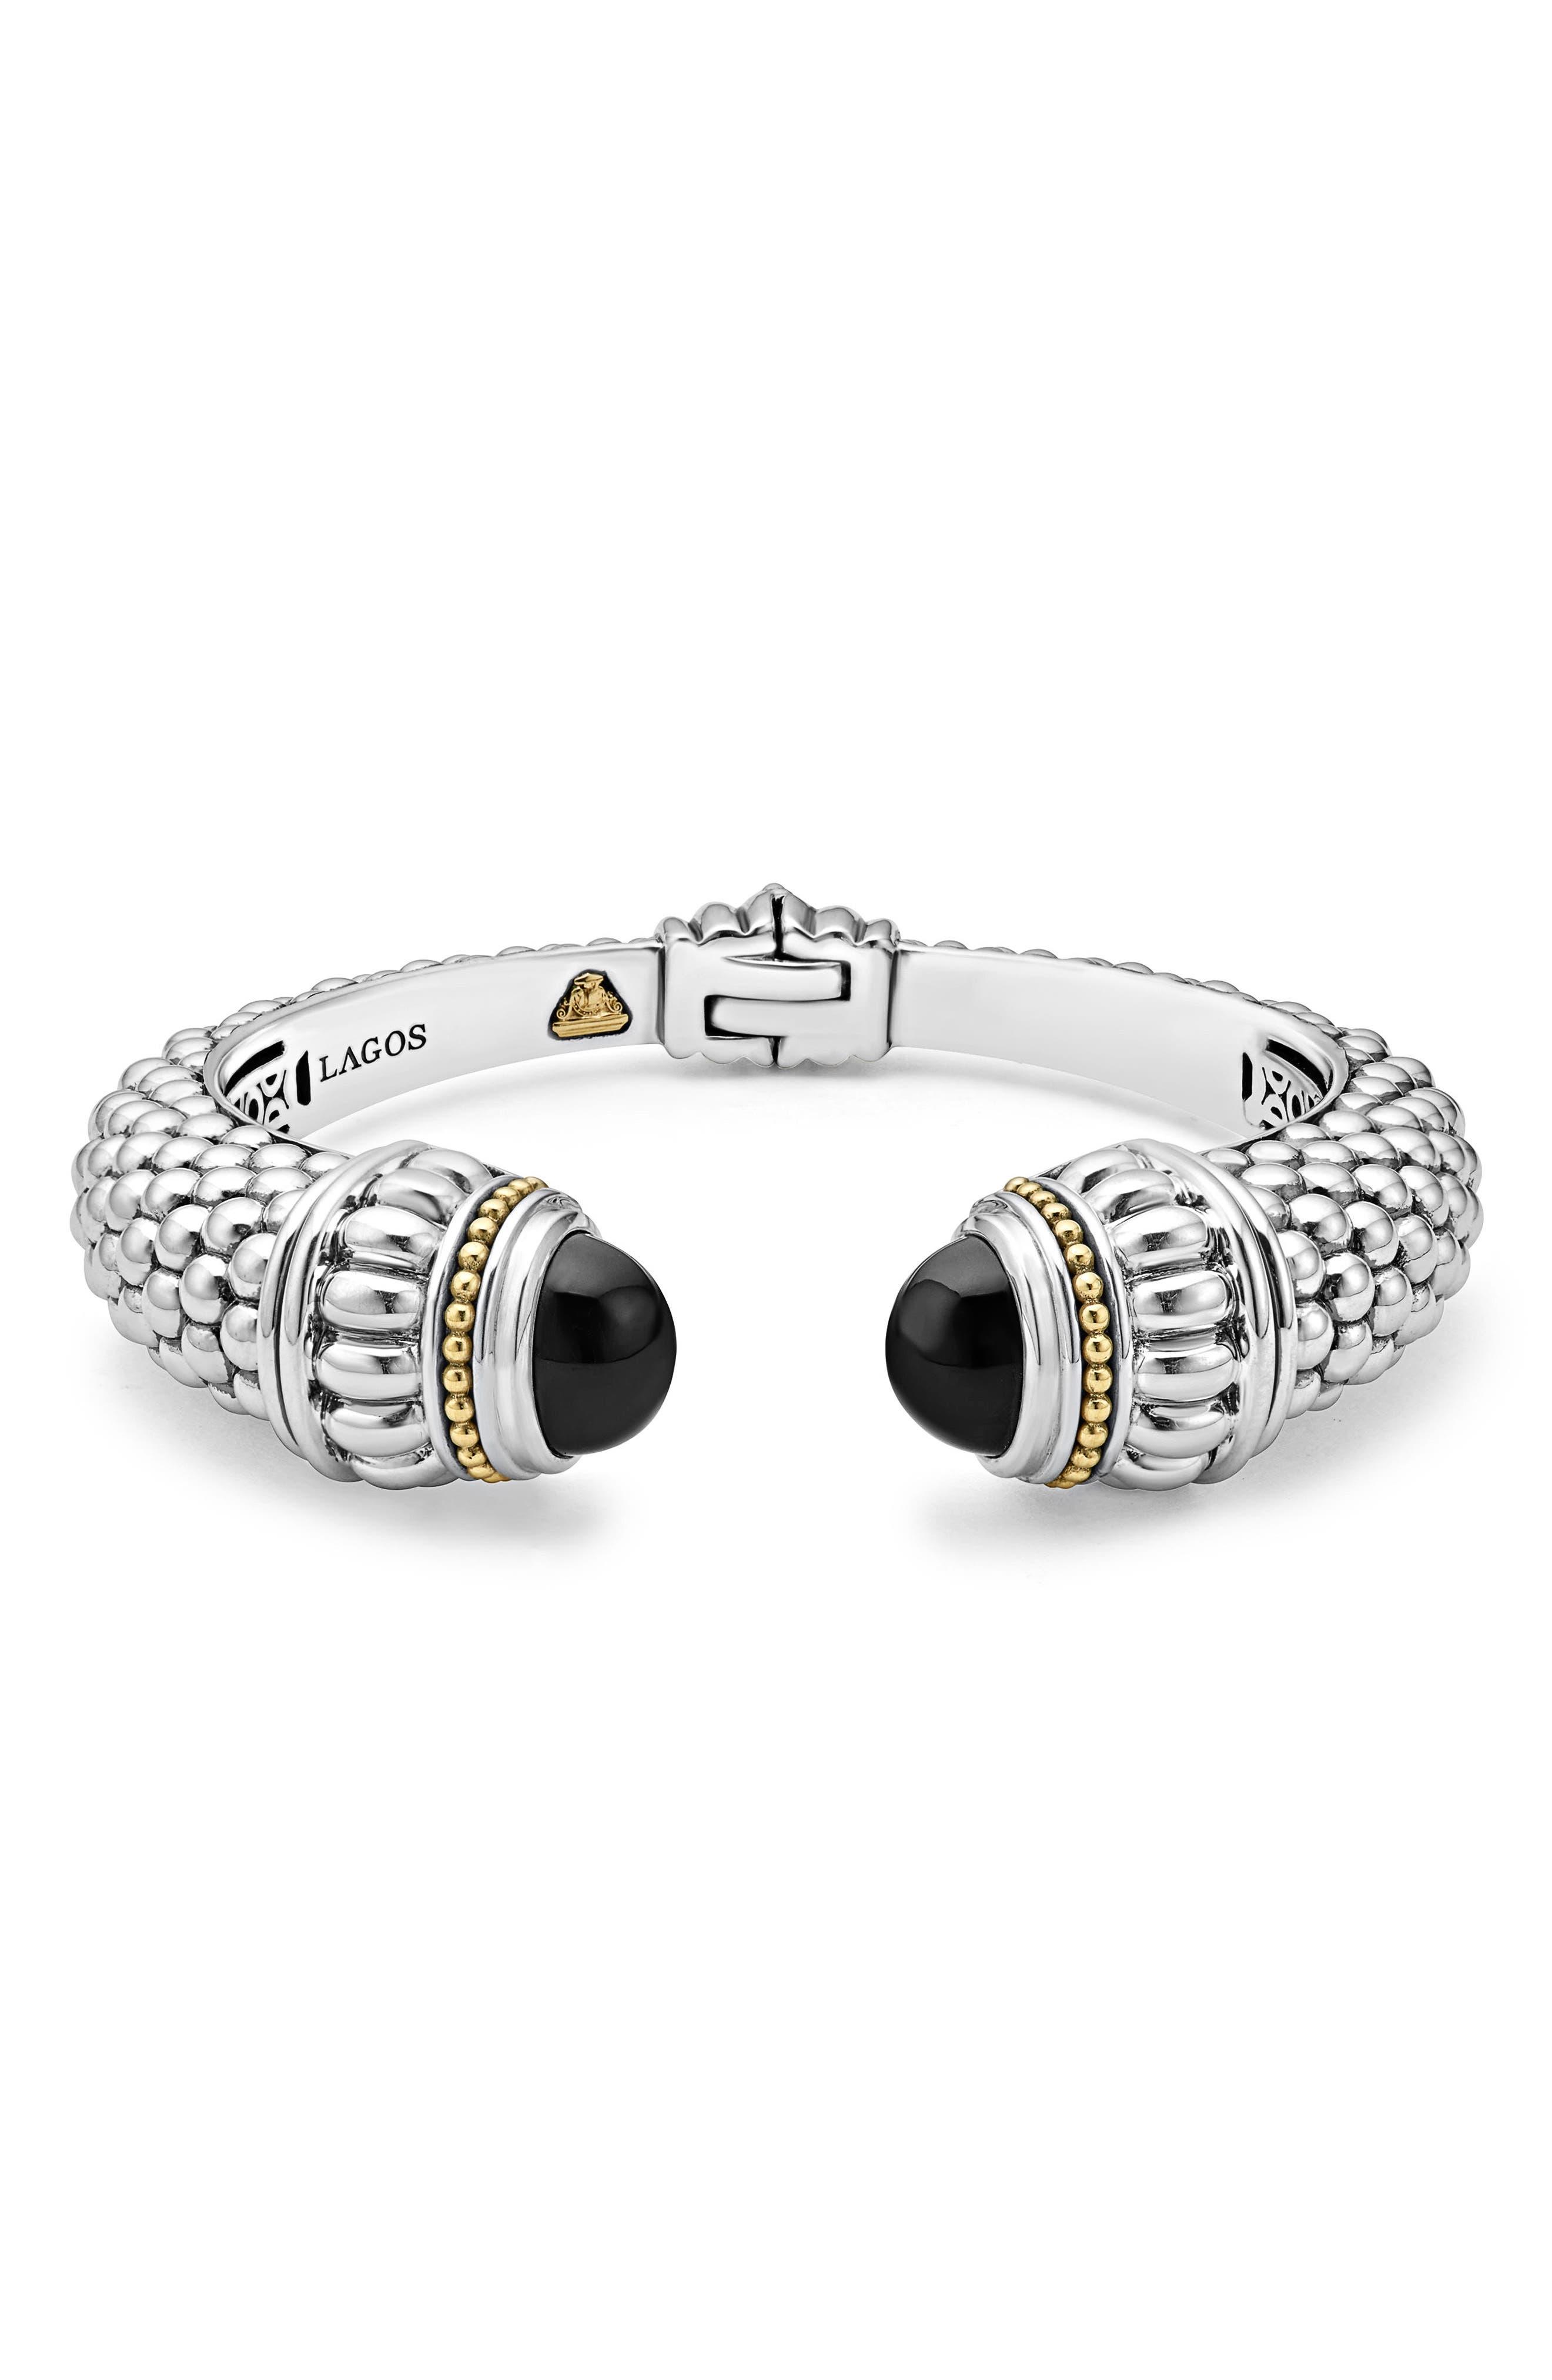 Main Image - LAGOS Caviar Color Hinge Wrist Cuff